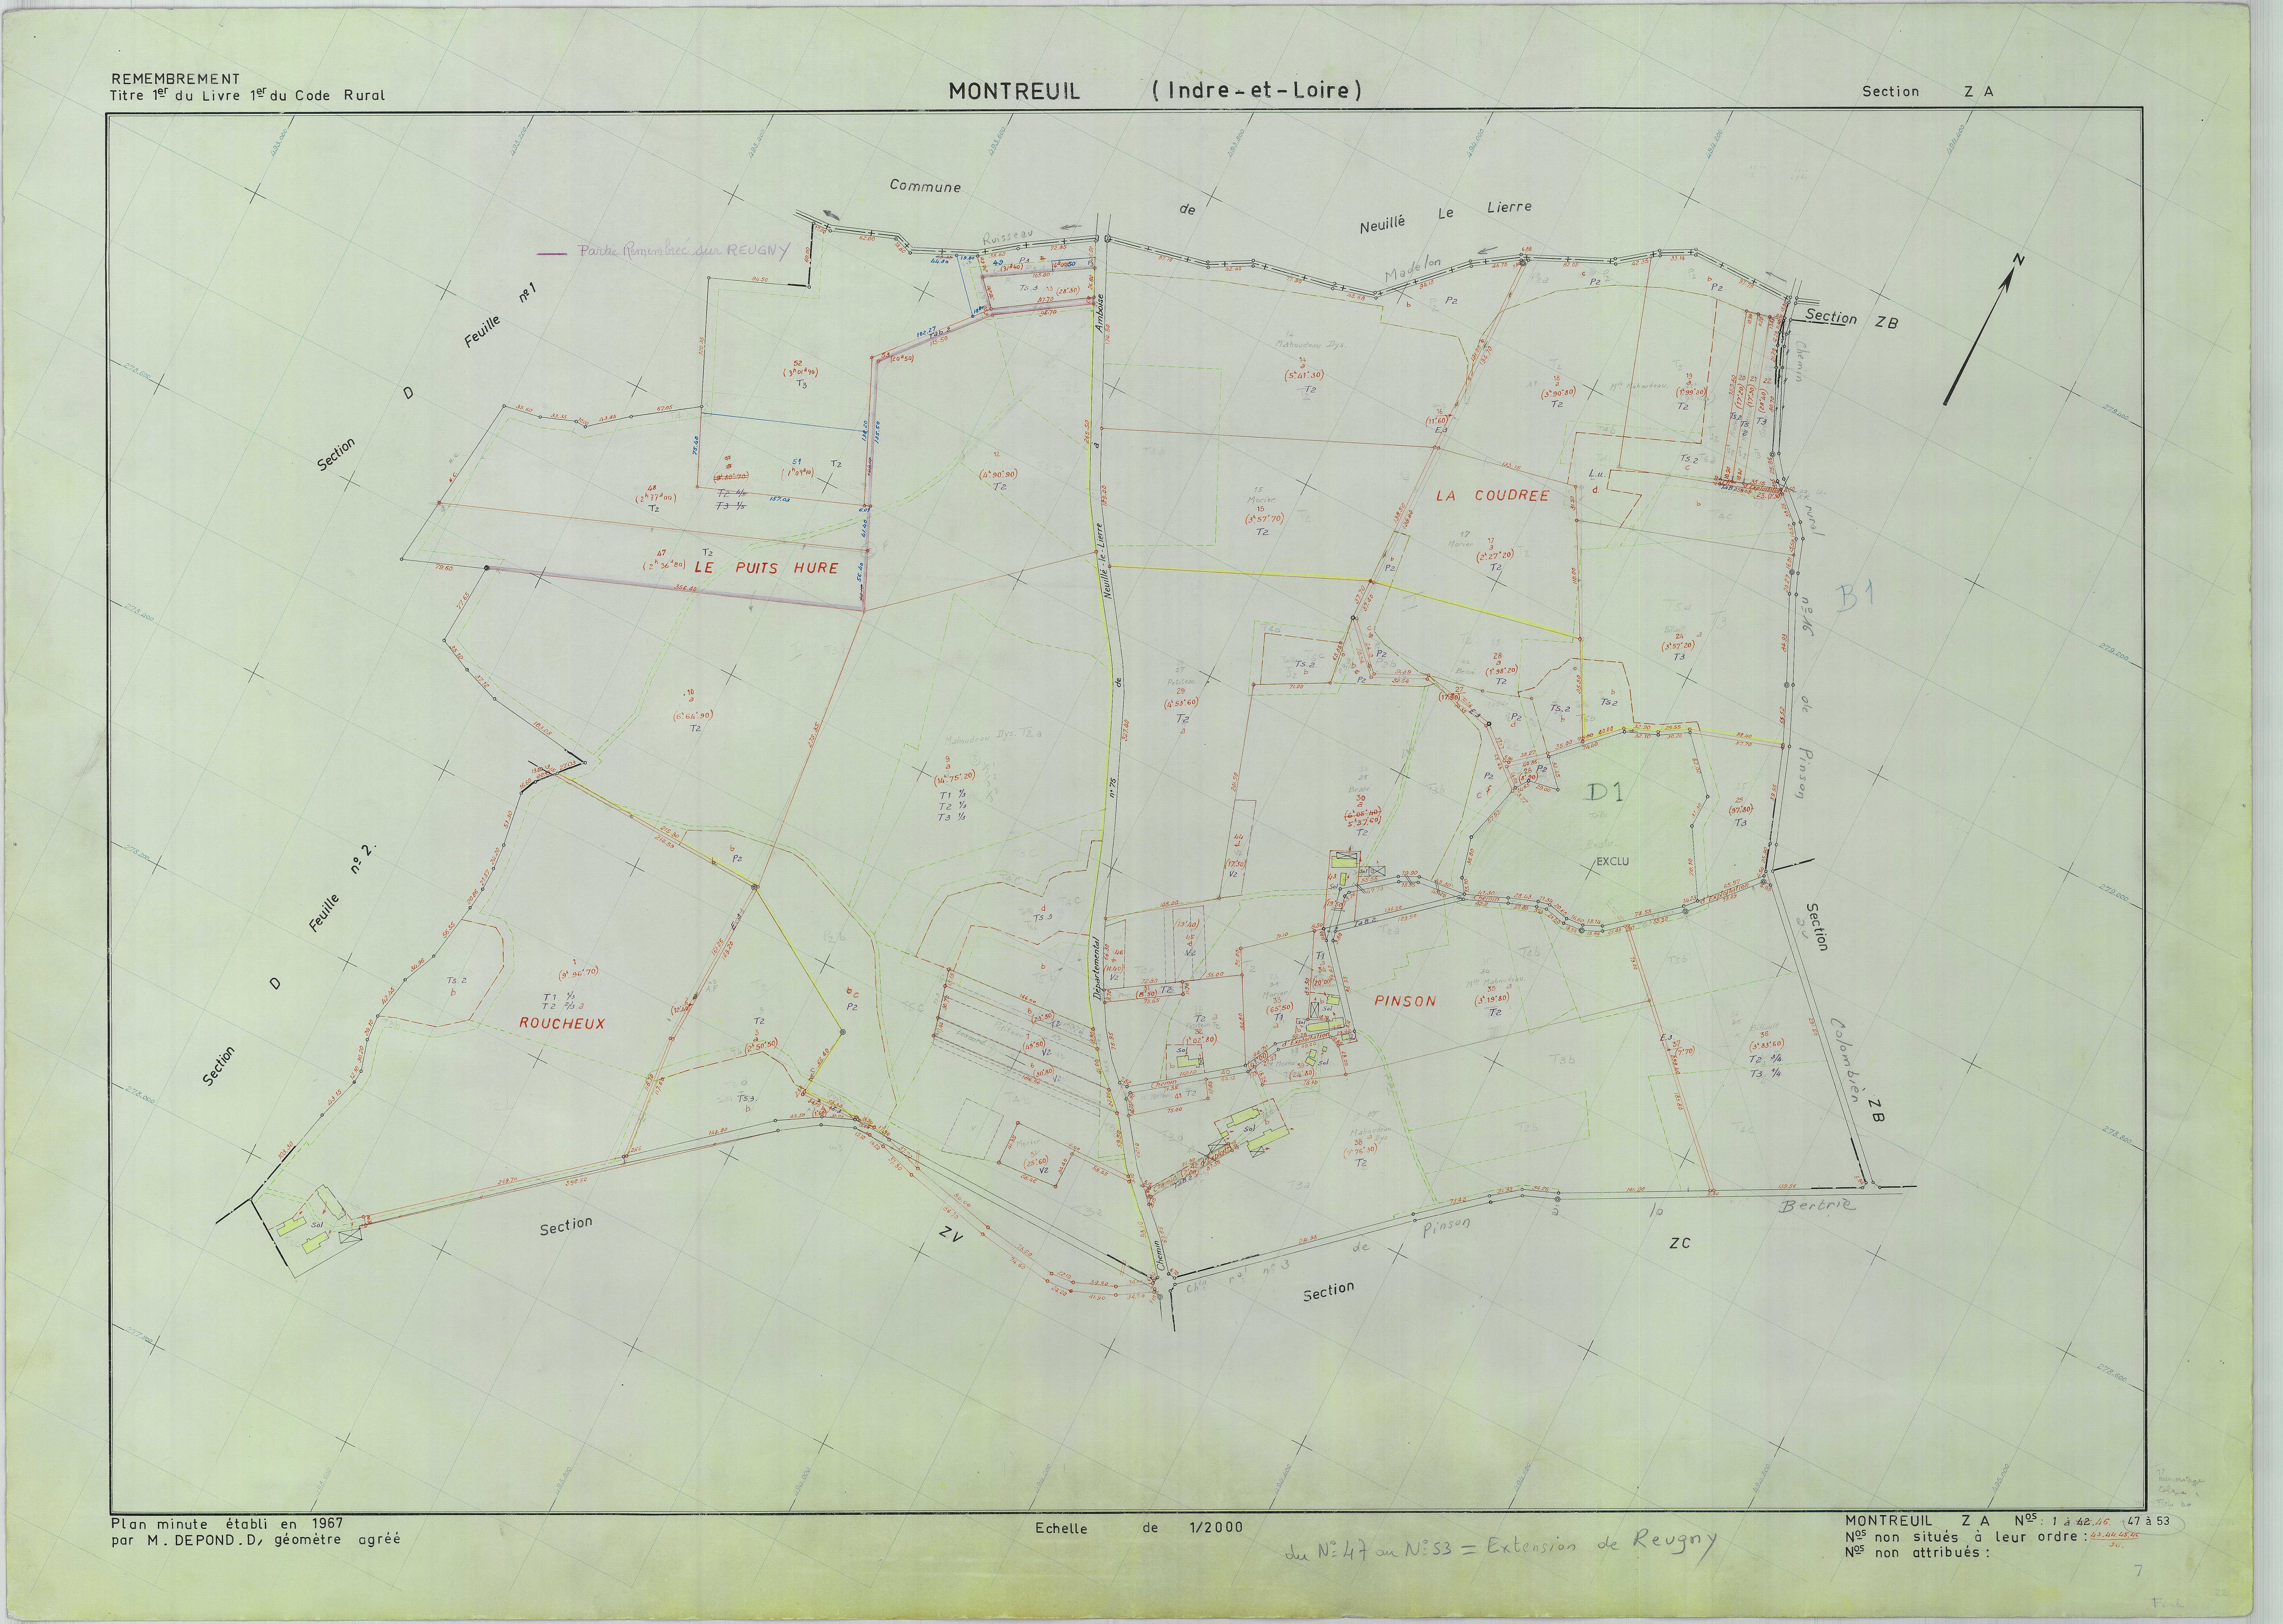 Section ZA